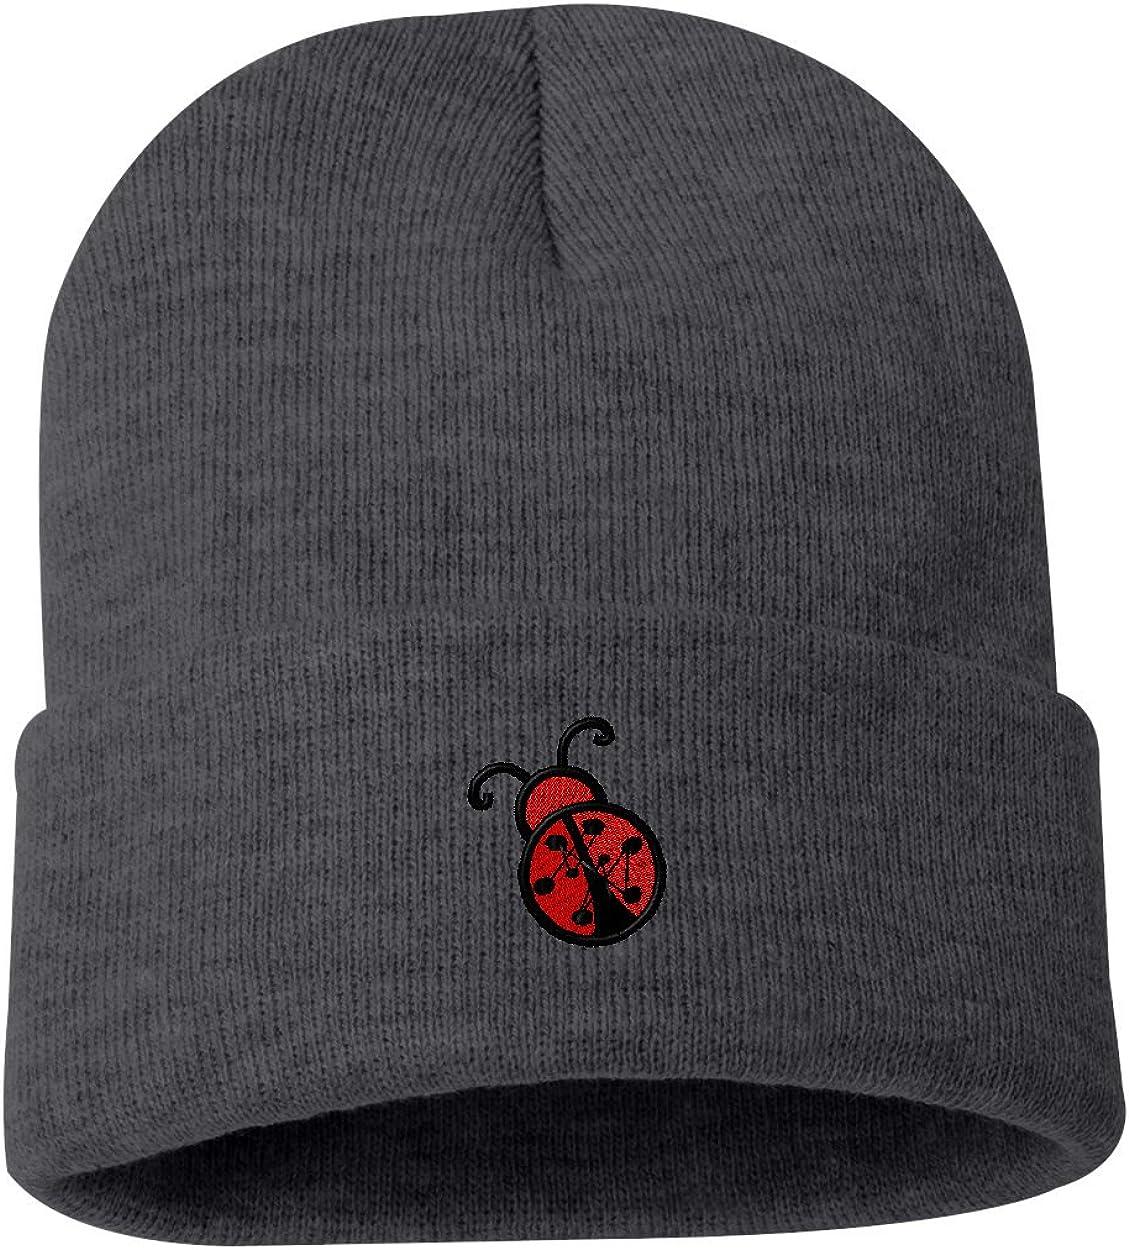 Ladybug/ Custom Personalized Embroidery Embroidered Beanie